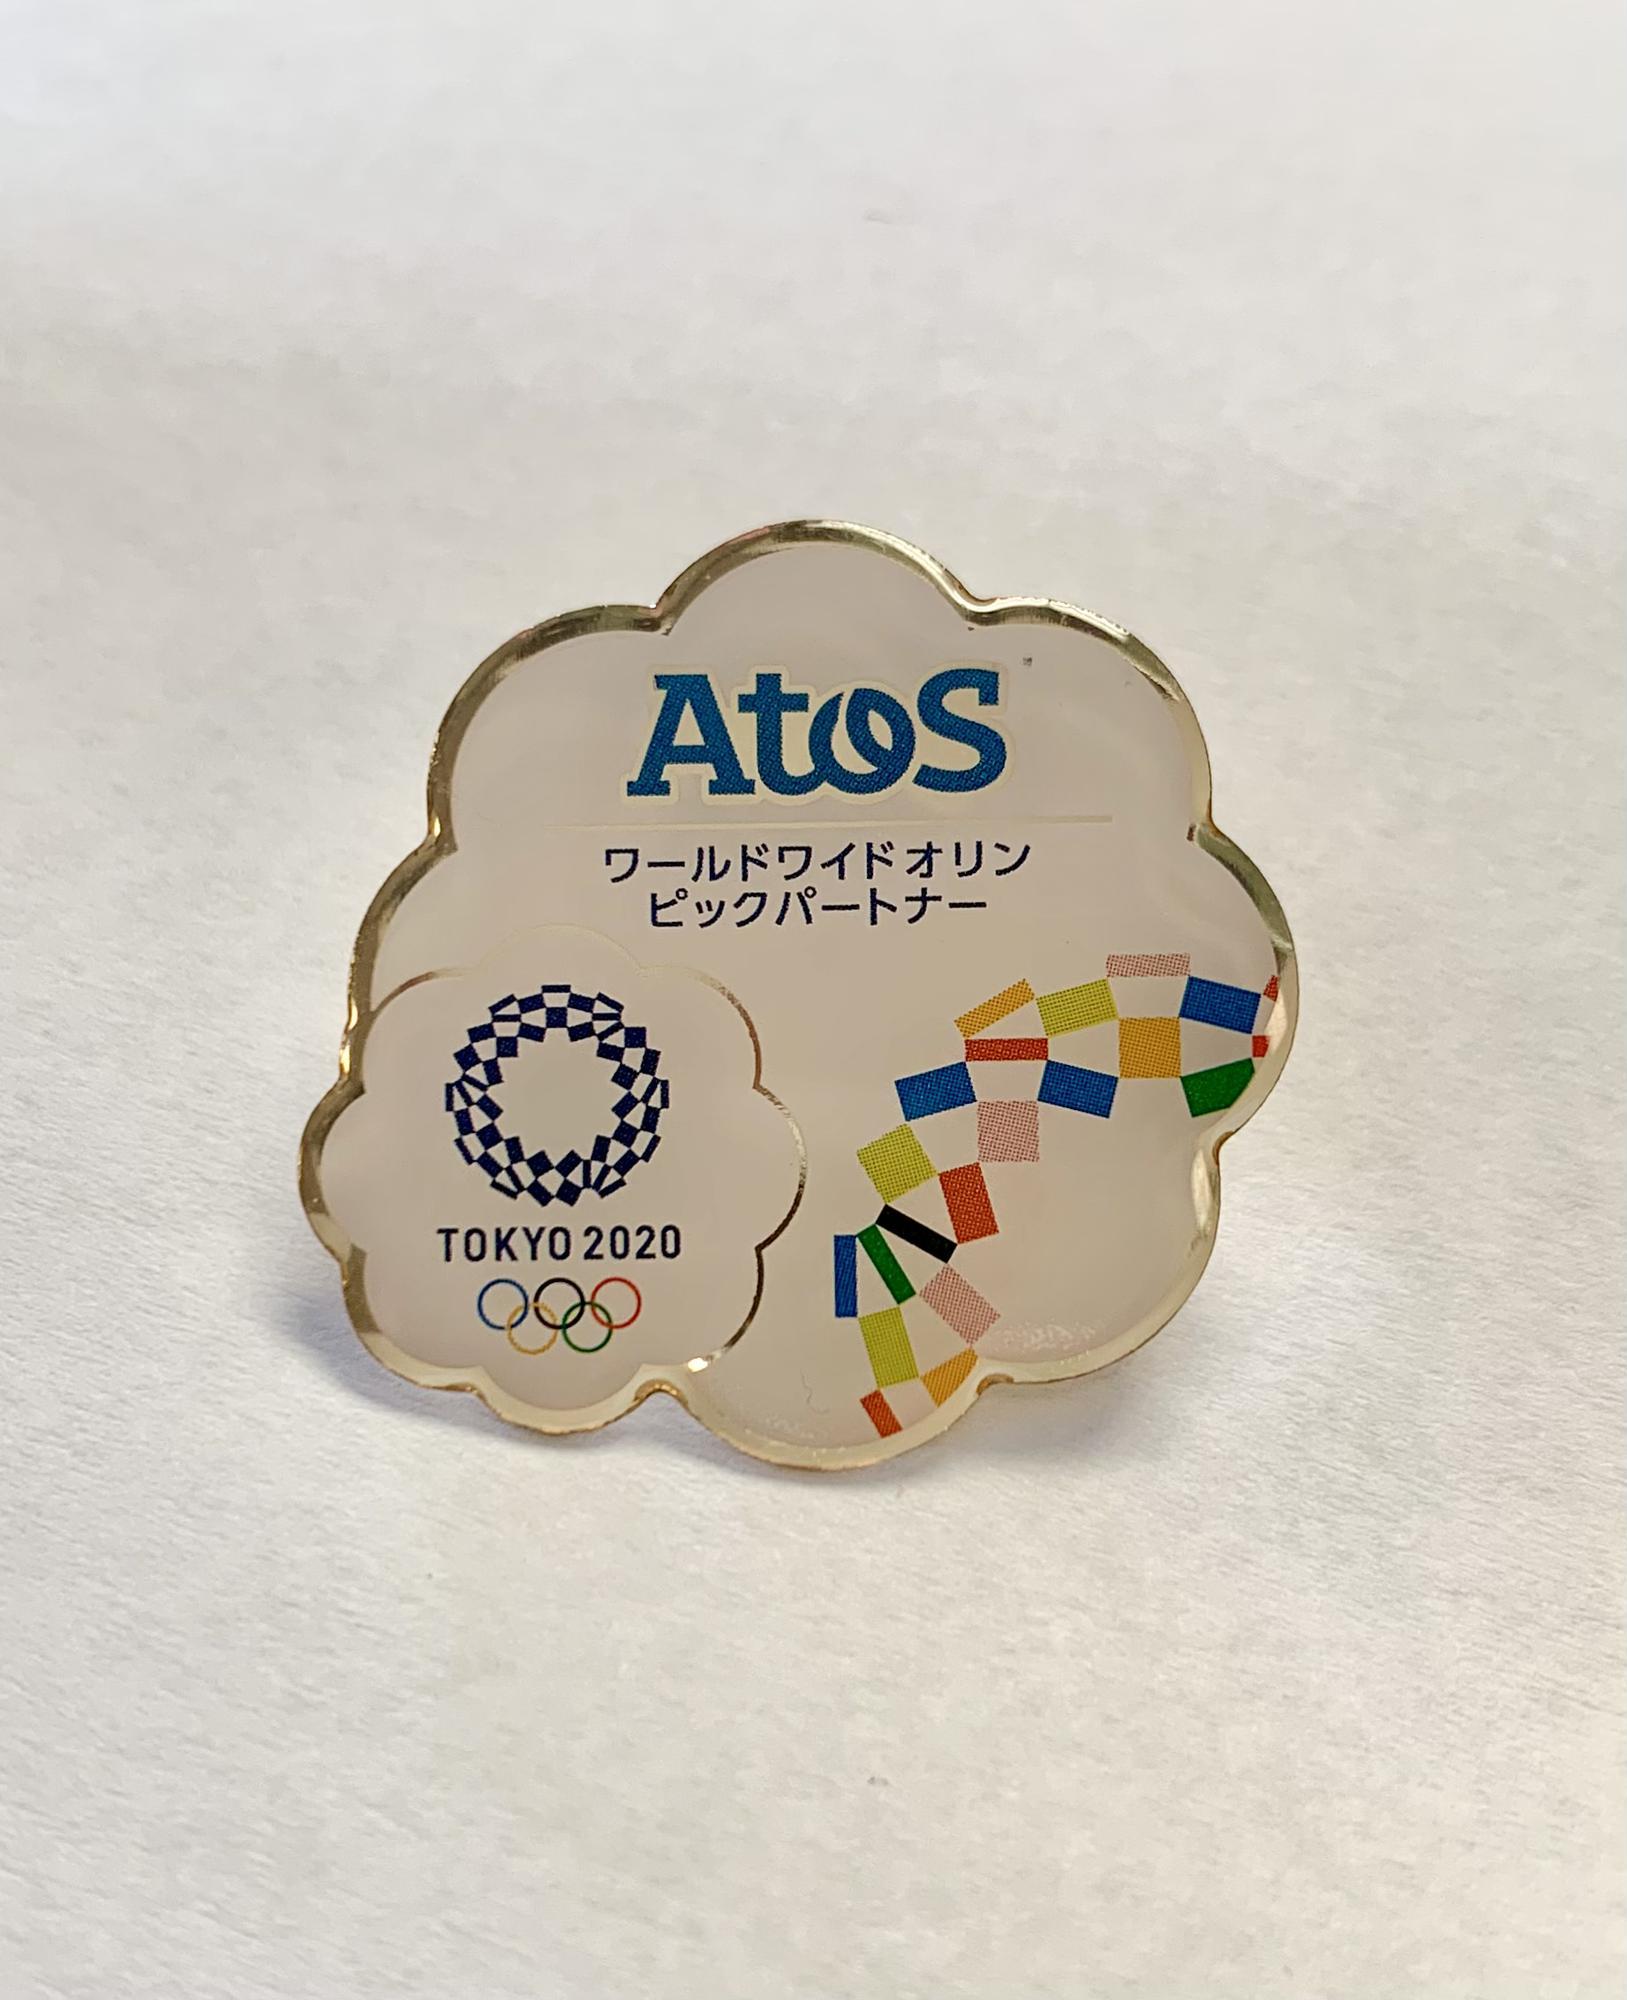 Atos w/ Tokyo 2020 Olympic Logo